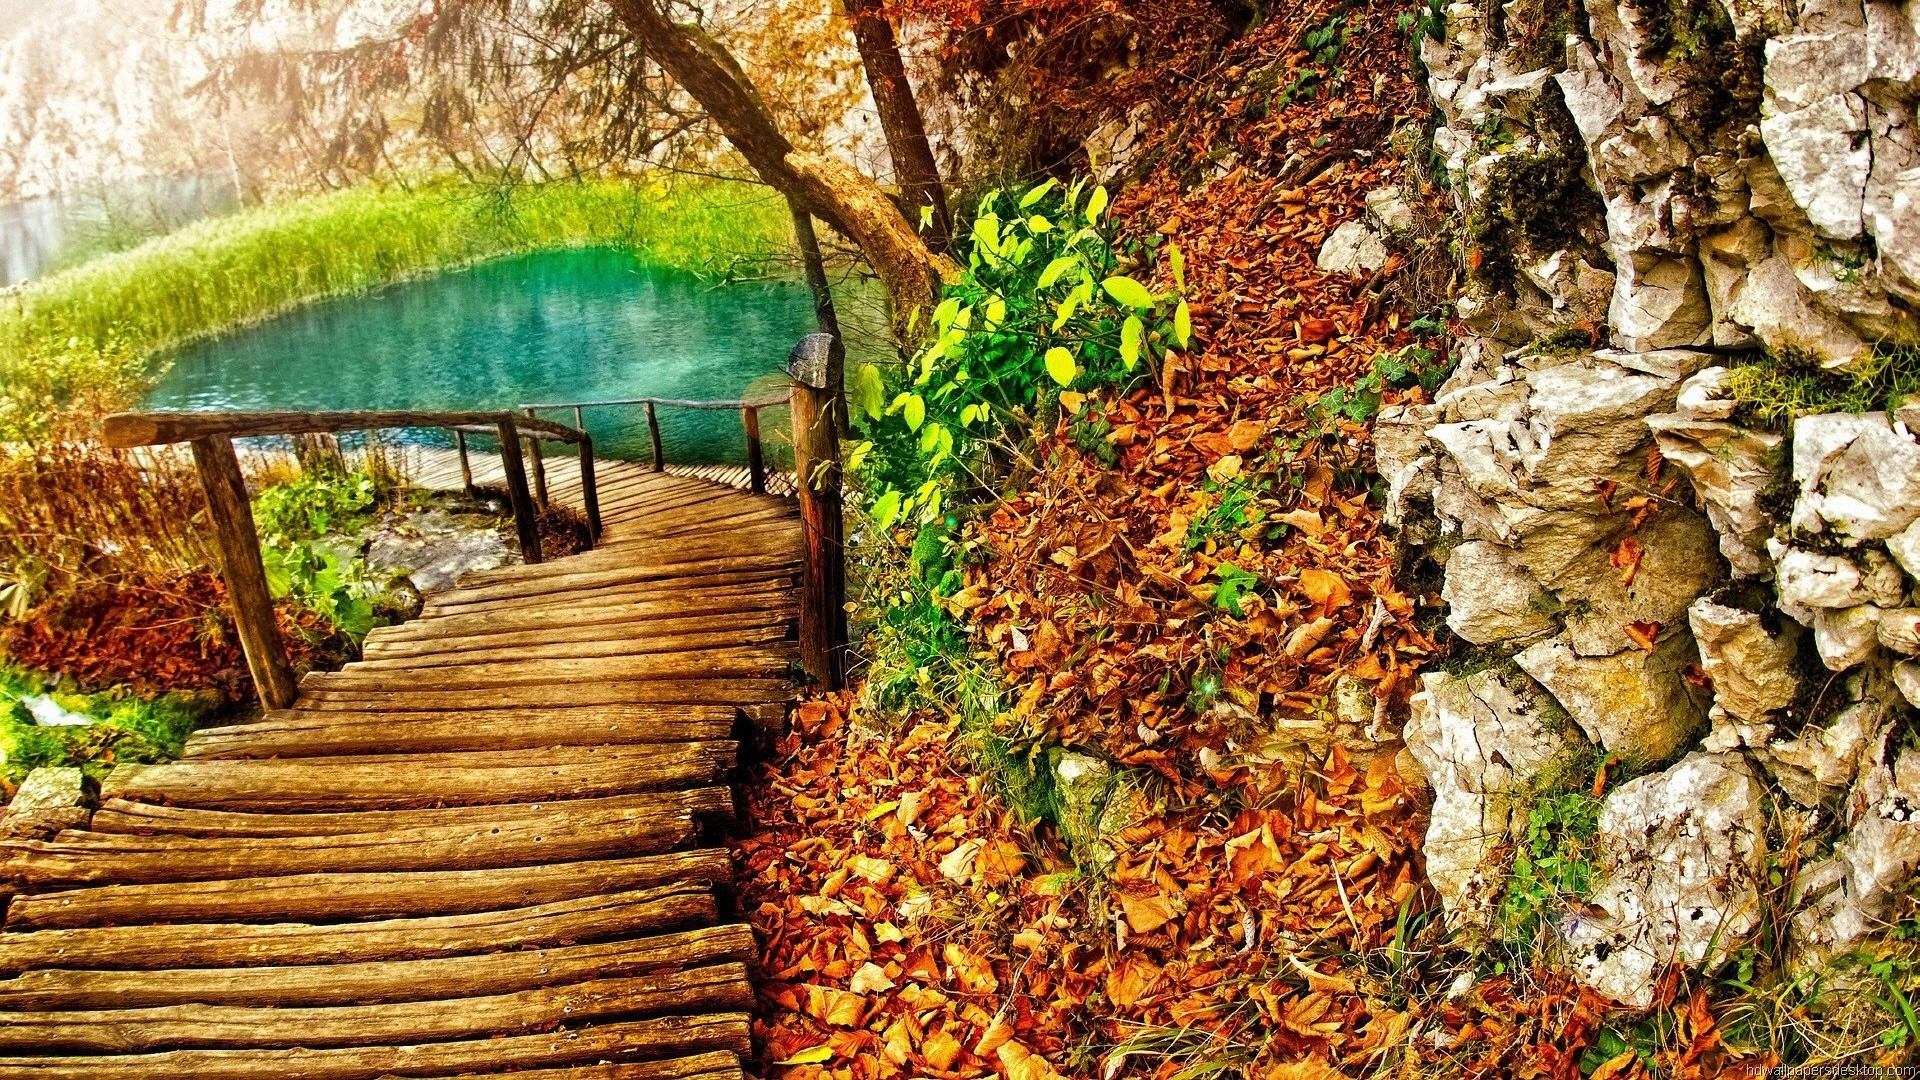 Nature Wallpapers Full Hd 1080p - HD Wallpaper